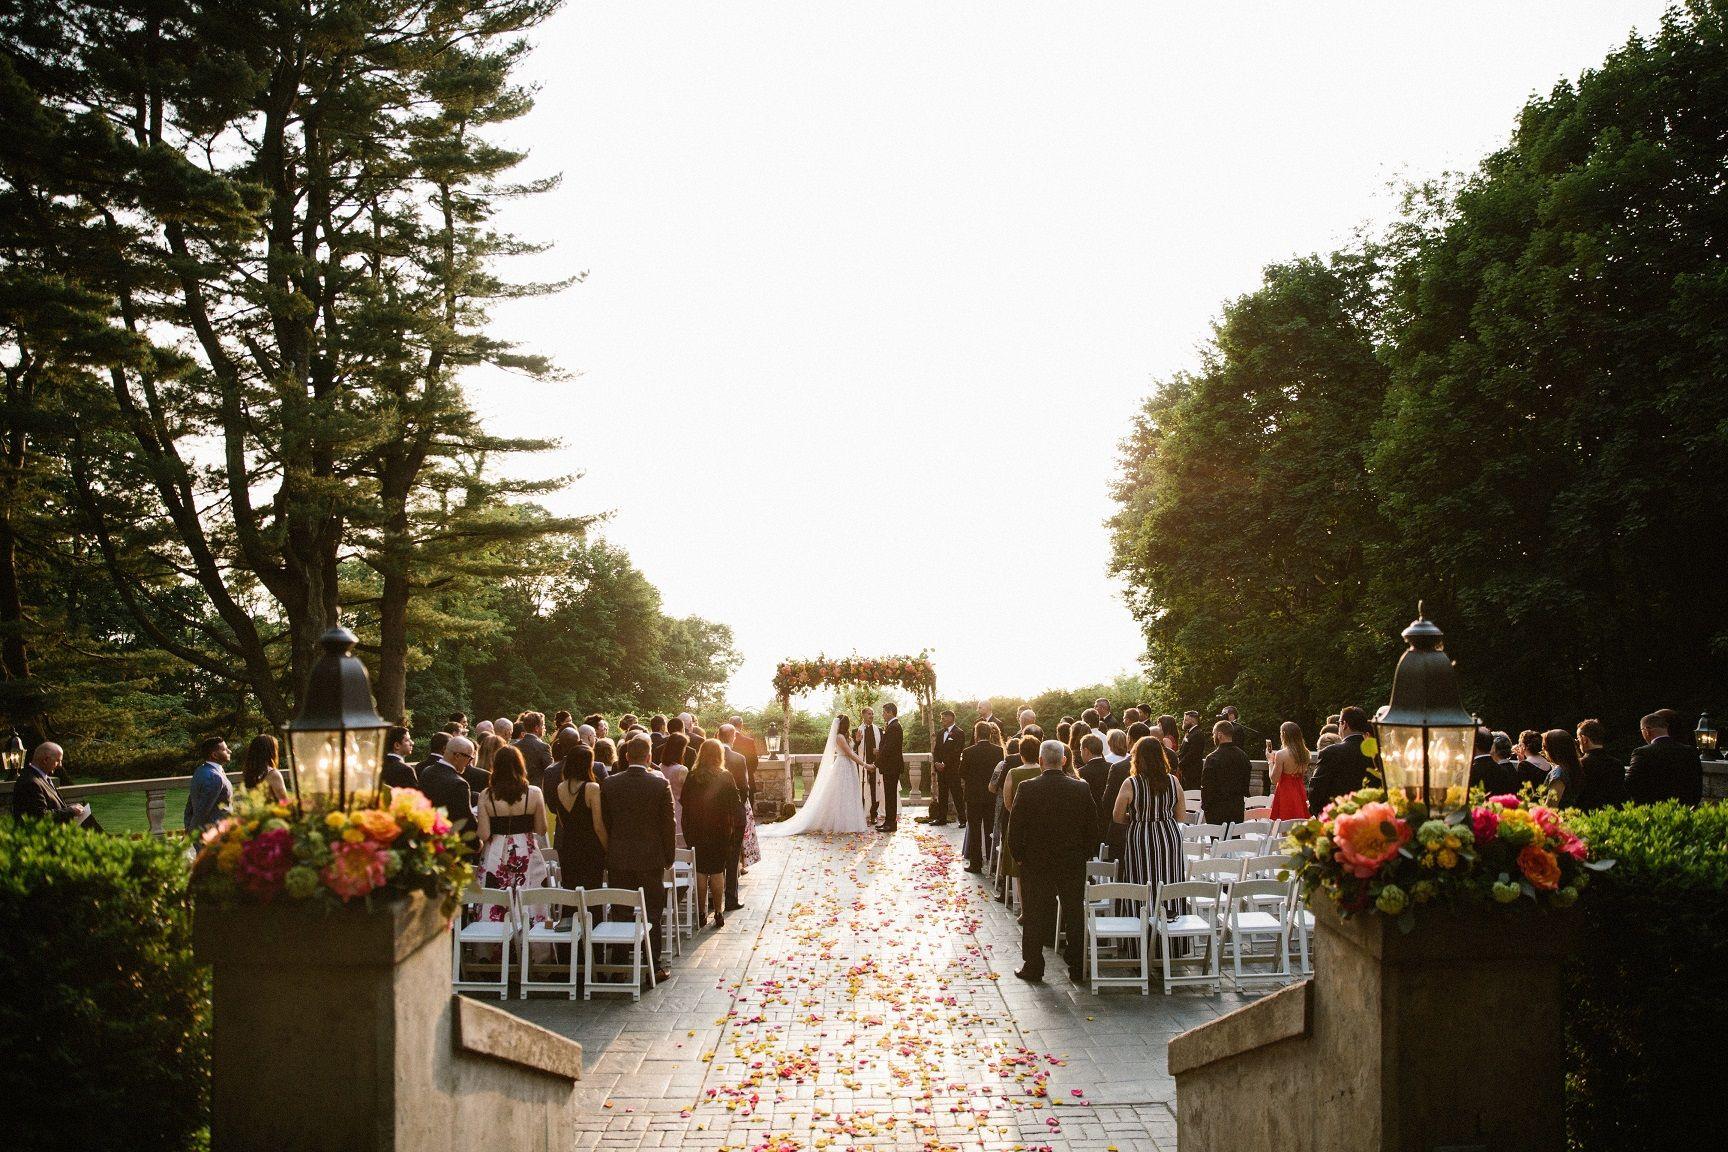 Tappan Hill Mansion Abigail Kirsch Catering Weddings Events New York Area Abigail Kirsch Wedding Gallery Wedding